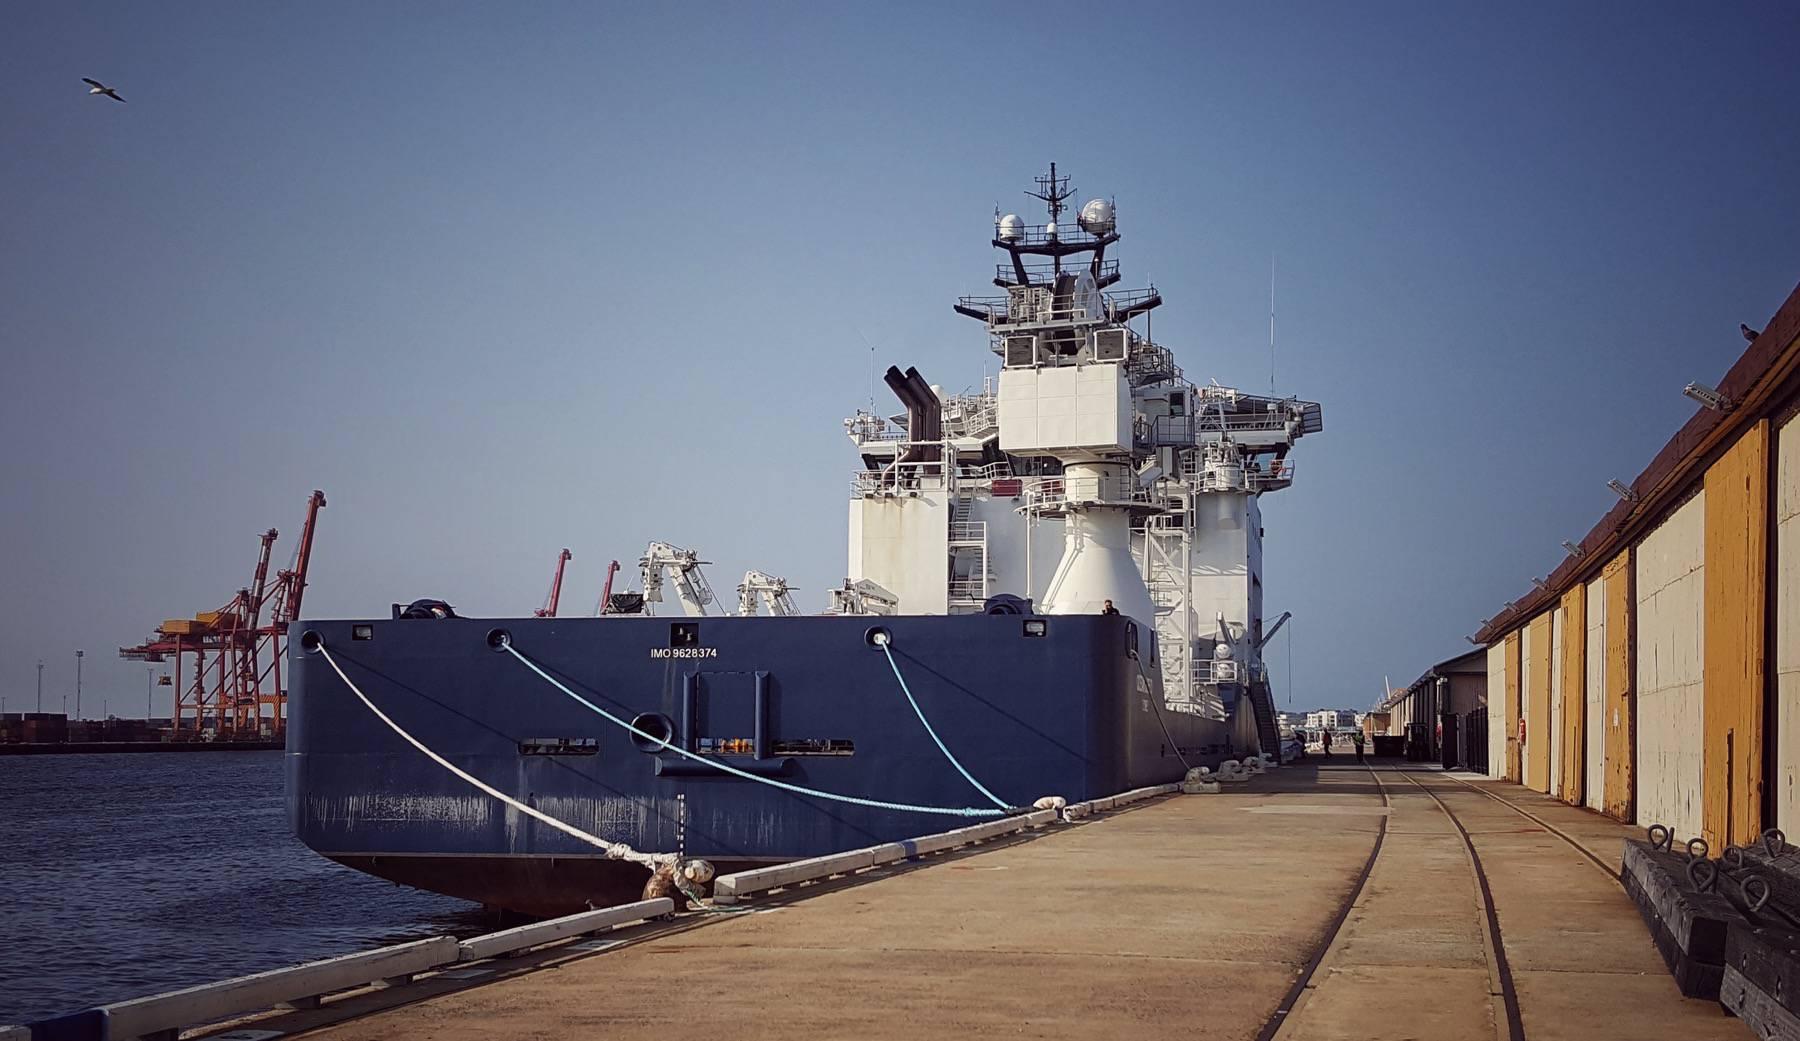 ABFC-Ocean-shield-fremantle-port-1